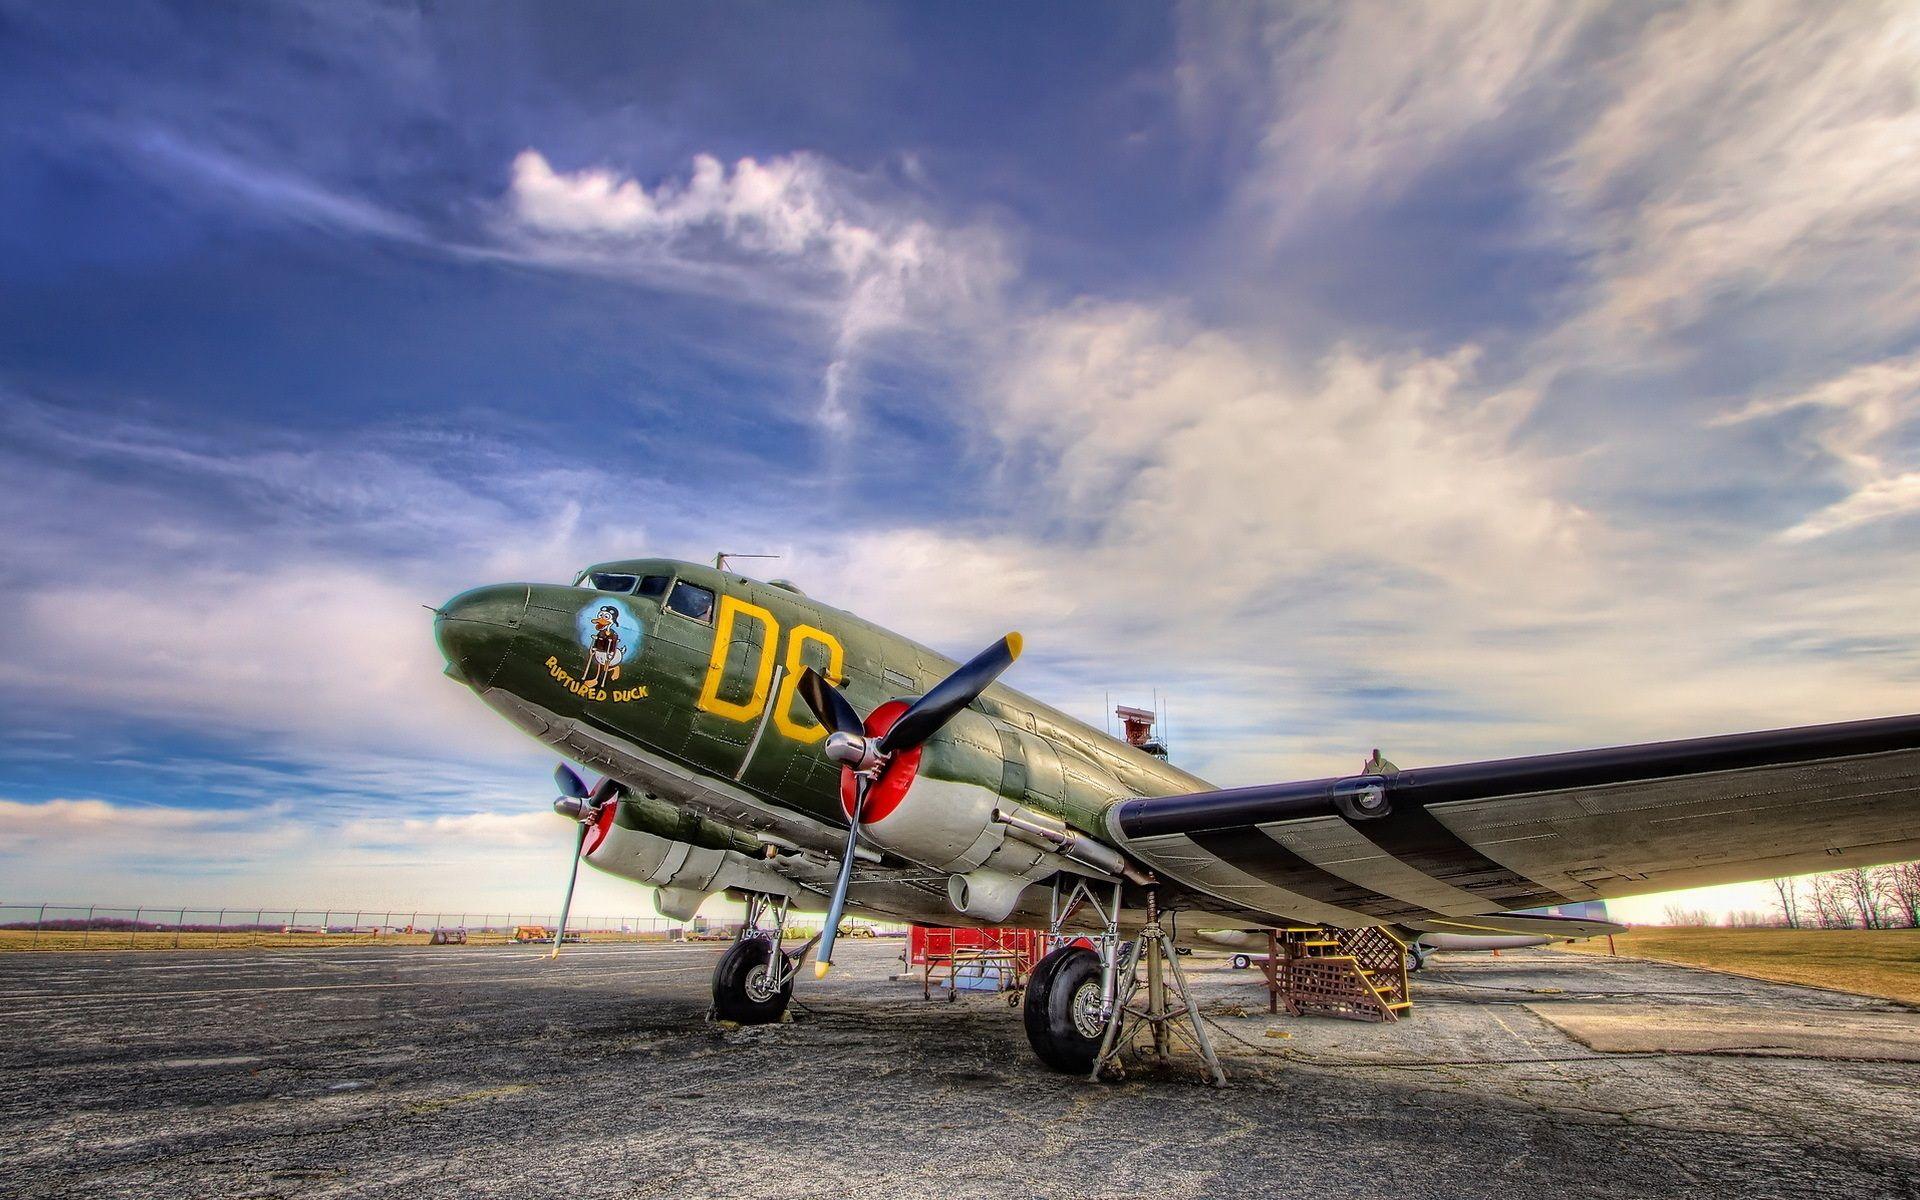 Douglas C47 Aircraft Bush Plane Airplane Wallpaper